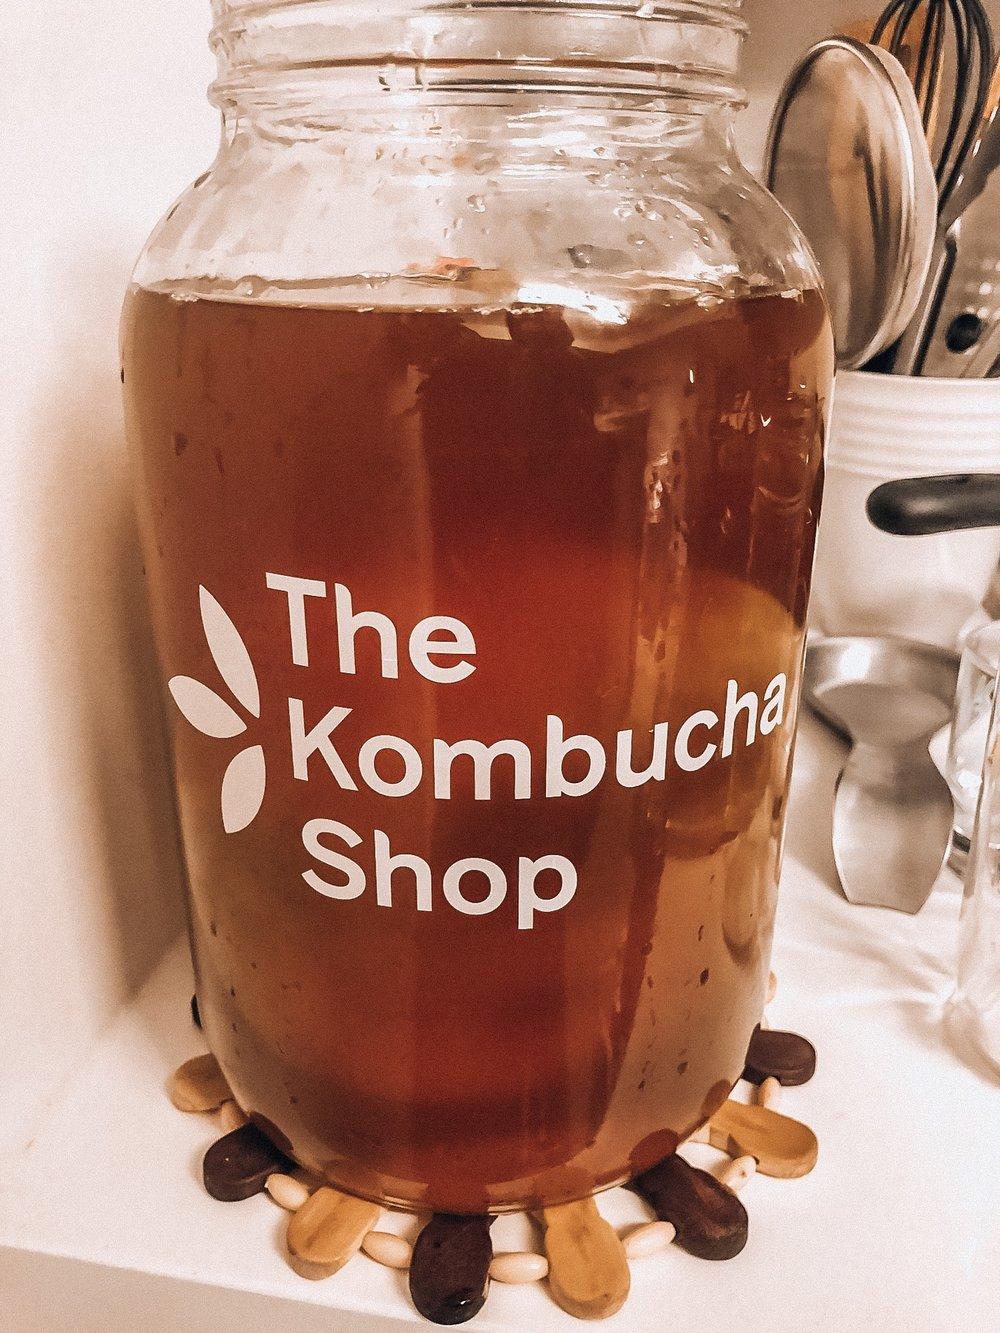 Brewing my own Kombucha